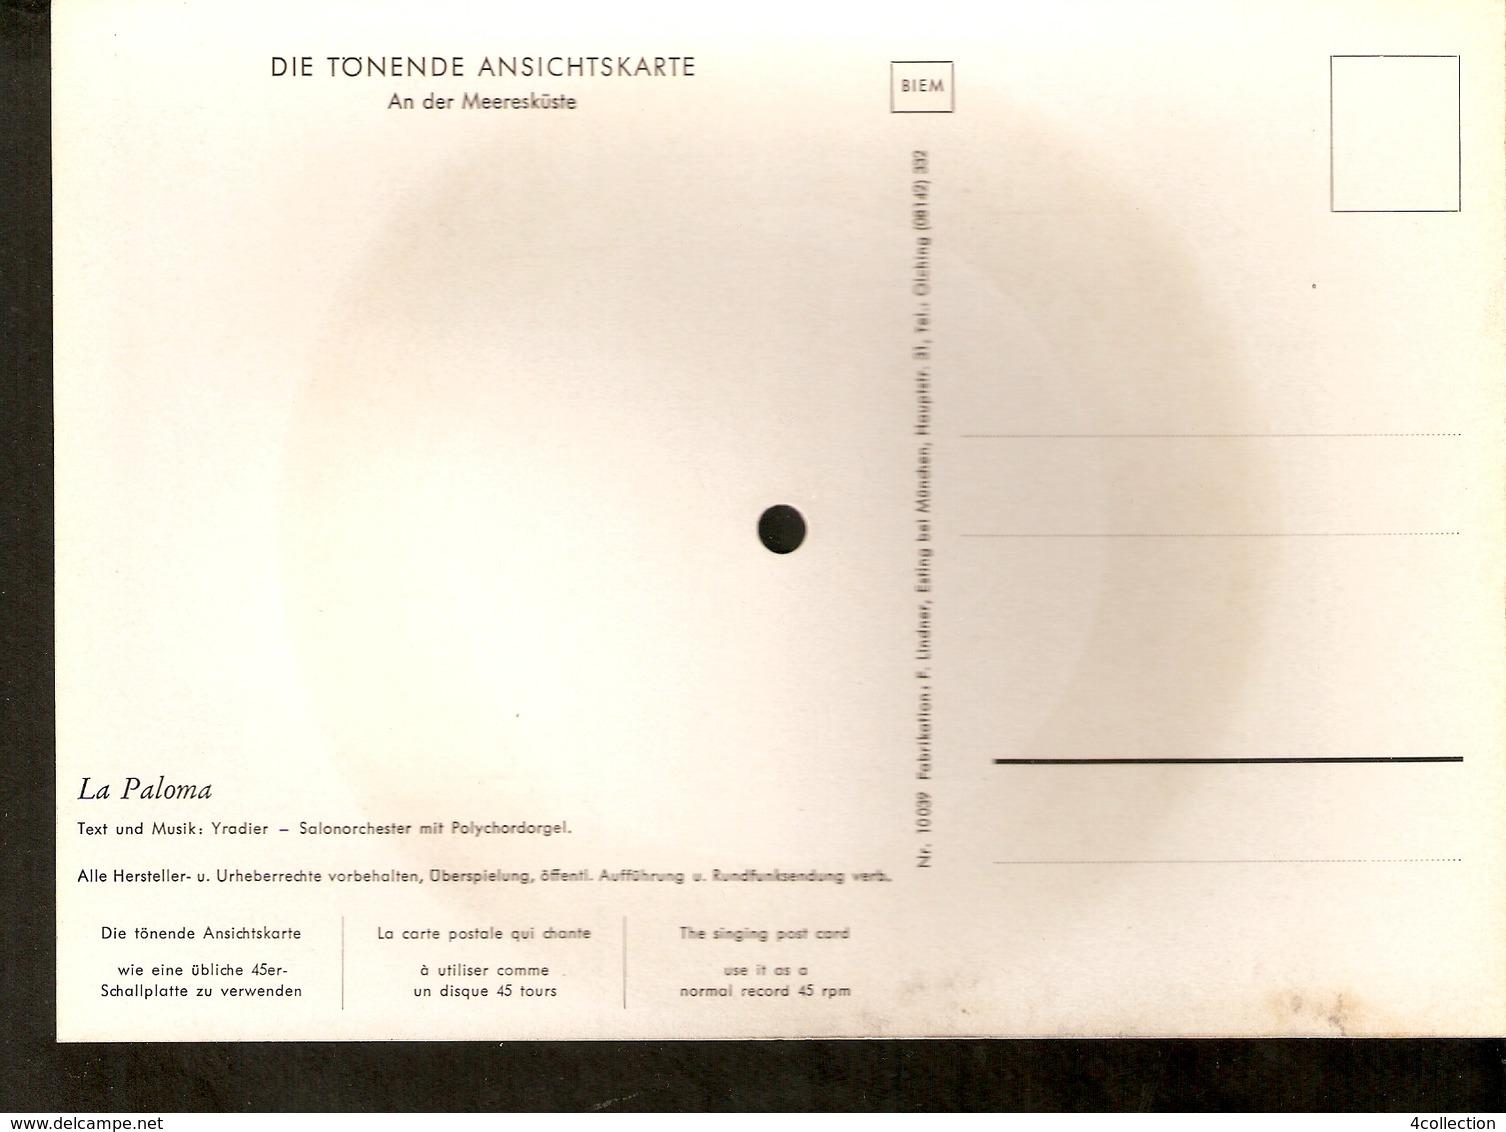 Old Musical 45rpm Record Singing Postcard A.d. Meereskuste La Paloma Yradier Salonorchester Mit Polychordorgel - Unclassified